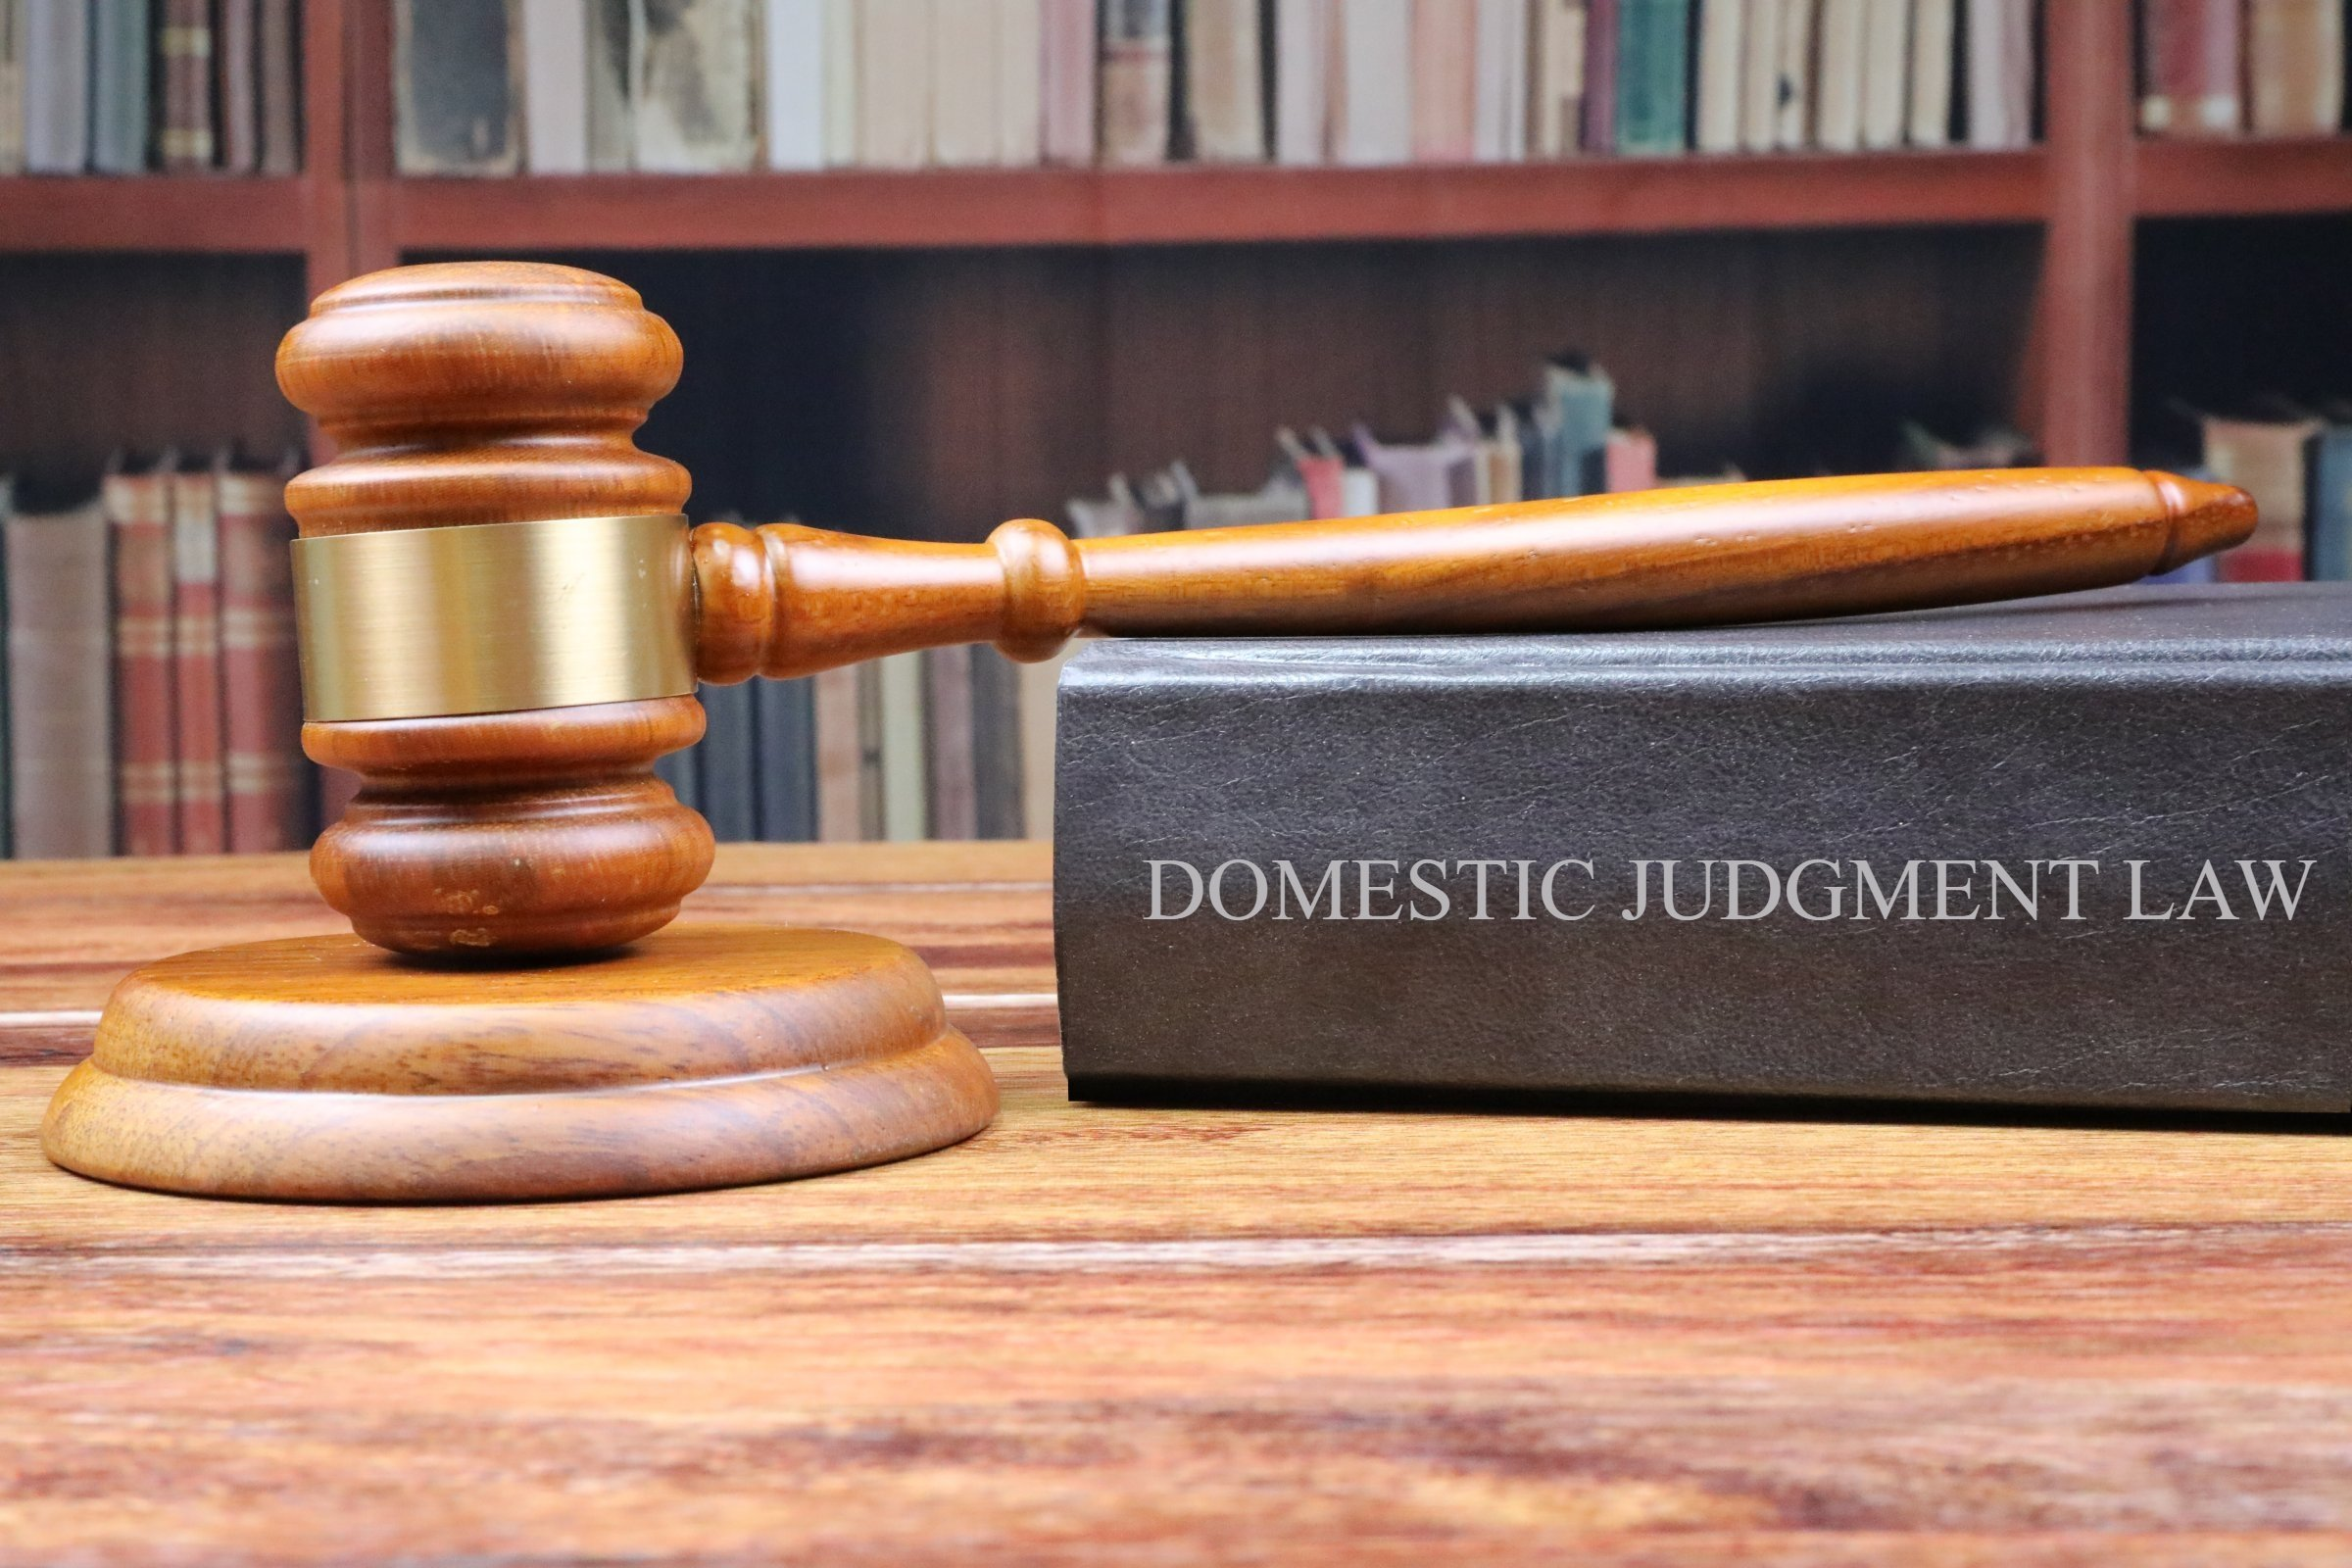 Domestic Judgment Law